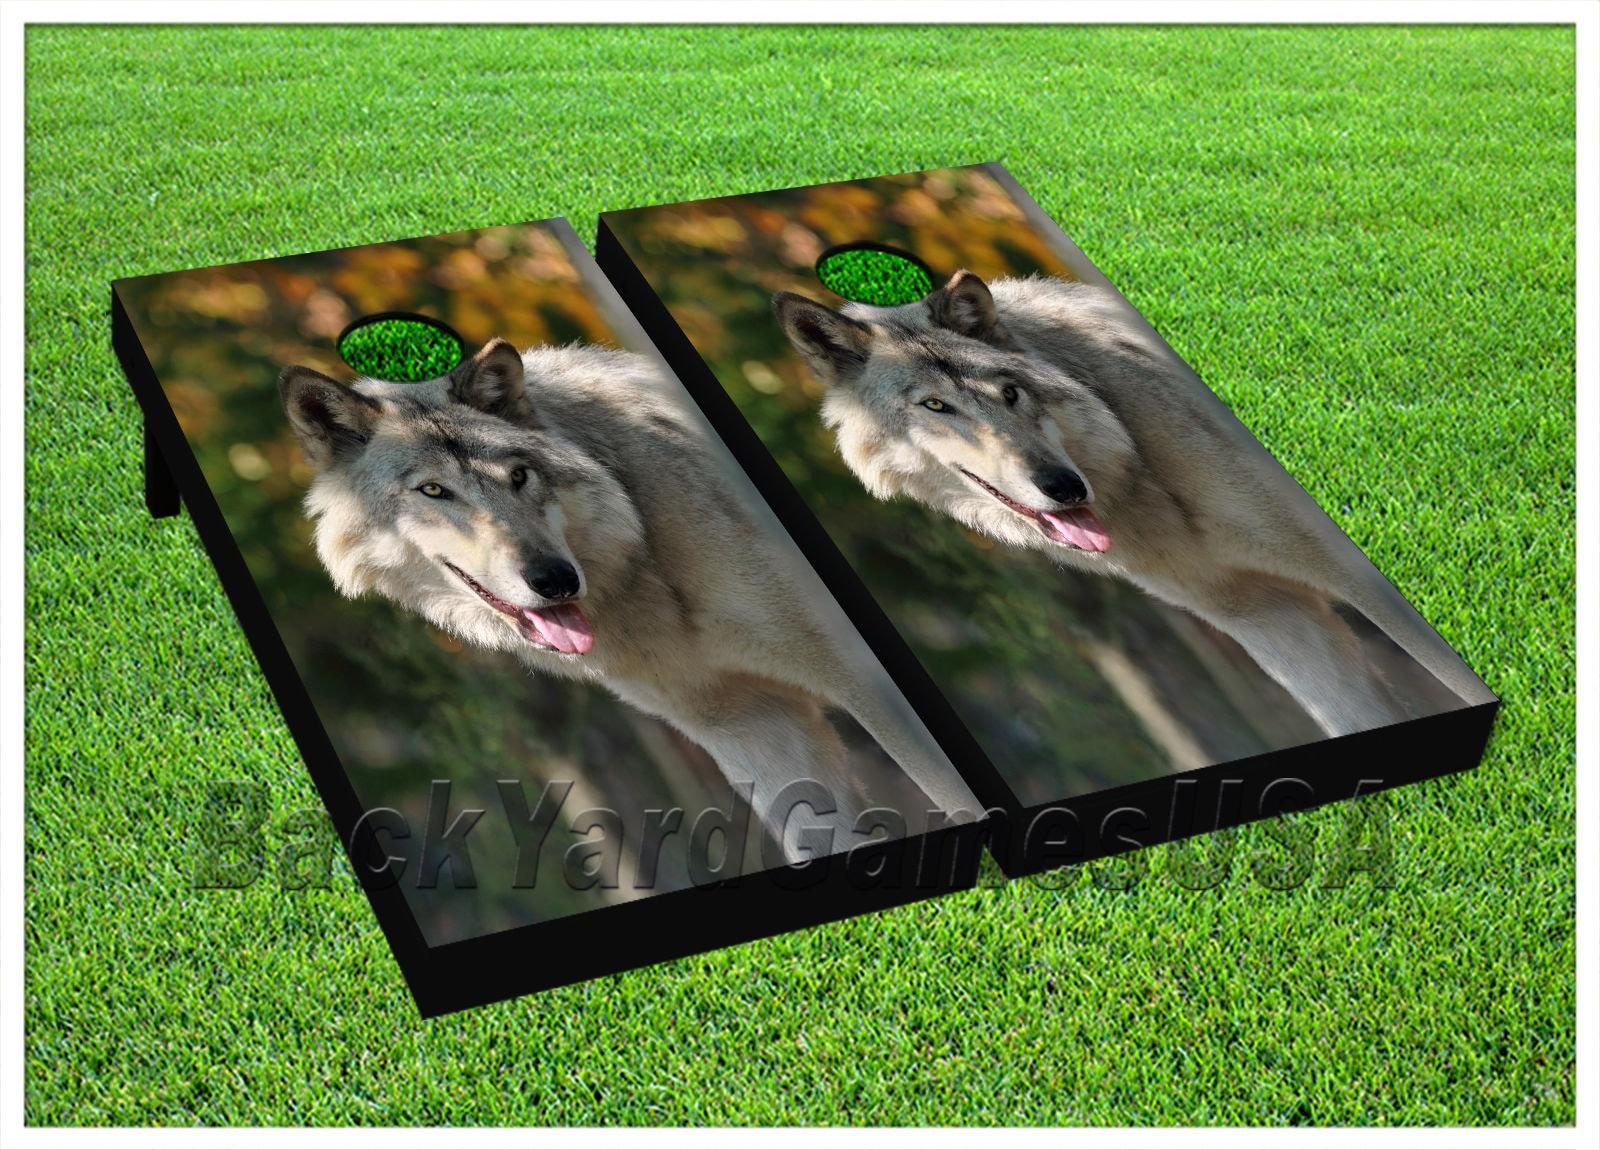 Astonishing Custom Cornhole Boards With Bags Wild Lone Wolf Cornhole Boards Game Set 765 Dailytribune Chair Design For Home Dailytribuneorg